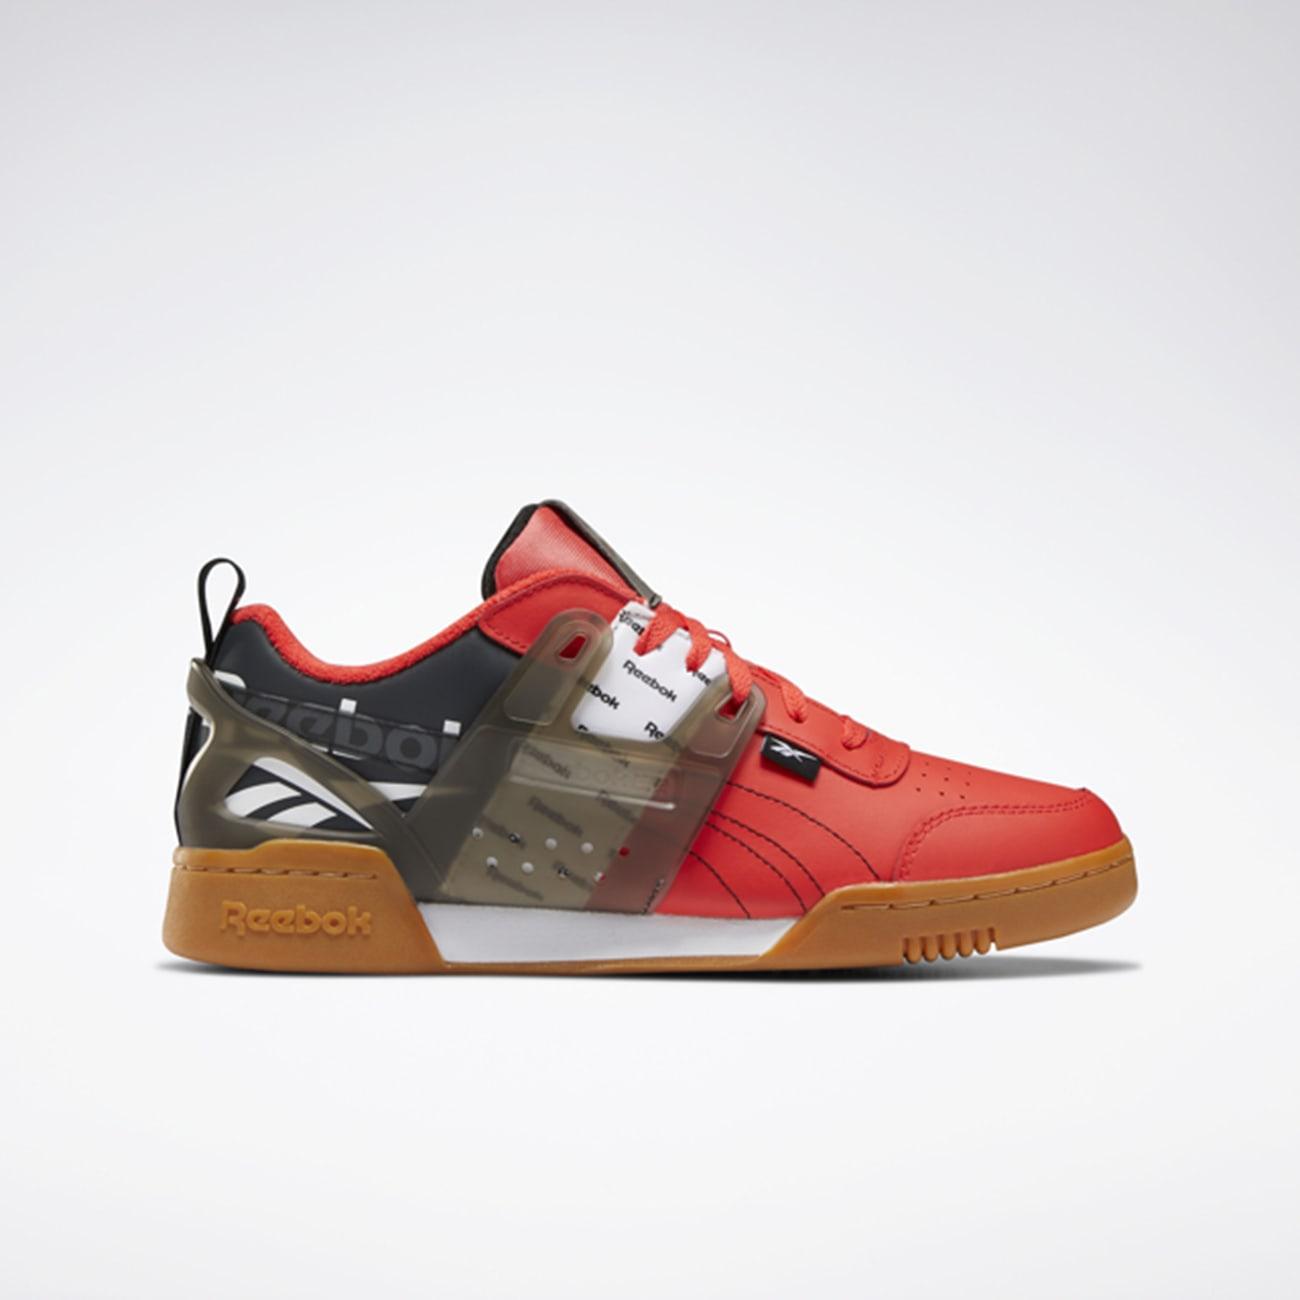 gg_sneakerhead_6